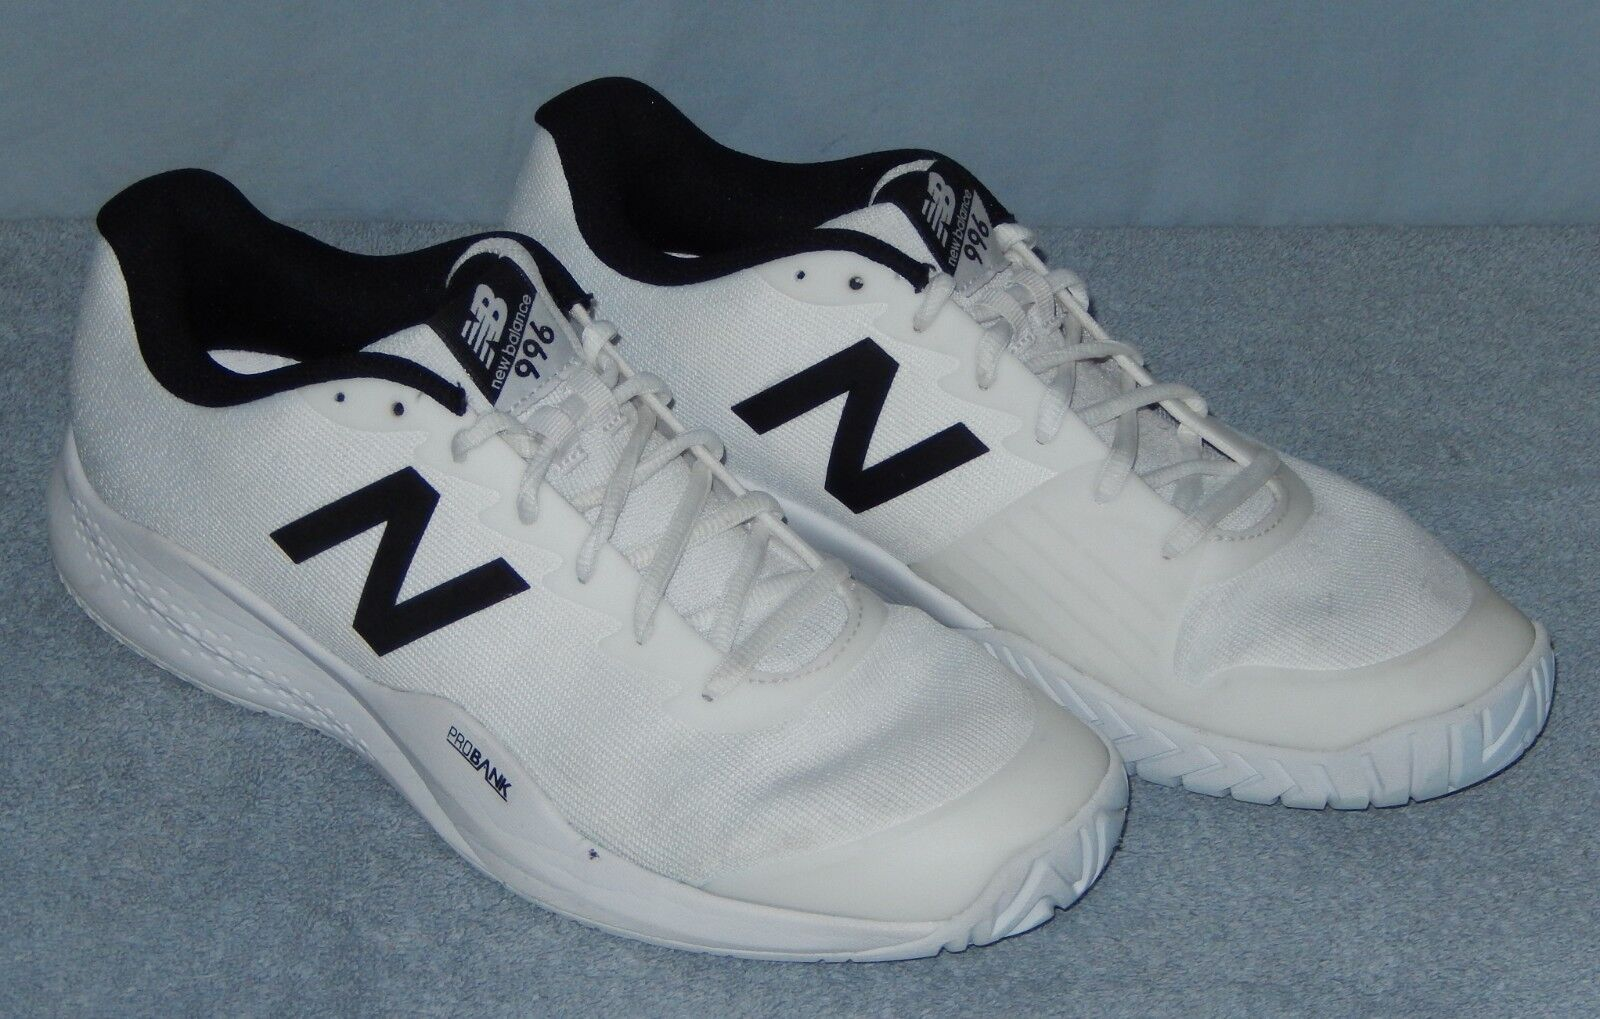 New Balance Mens Tennis shoes White Size 12.5 MCH996P3 996v3